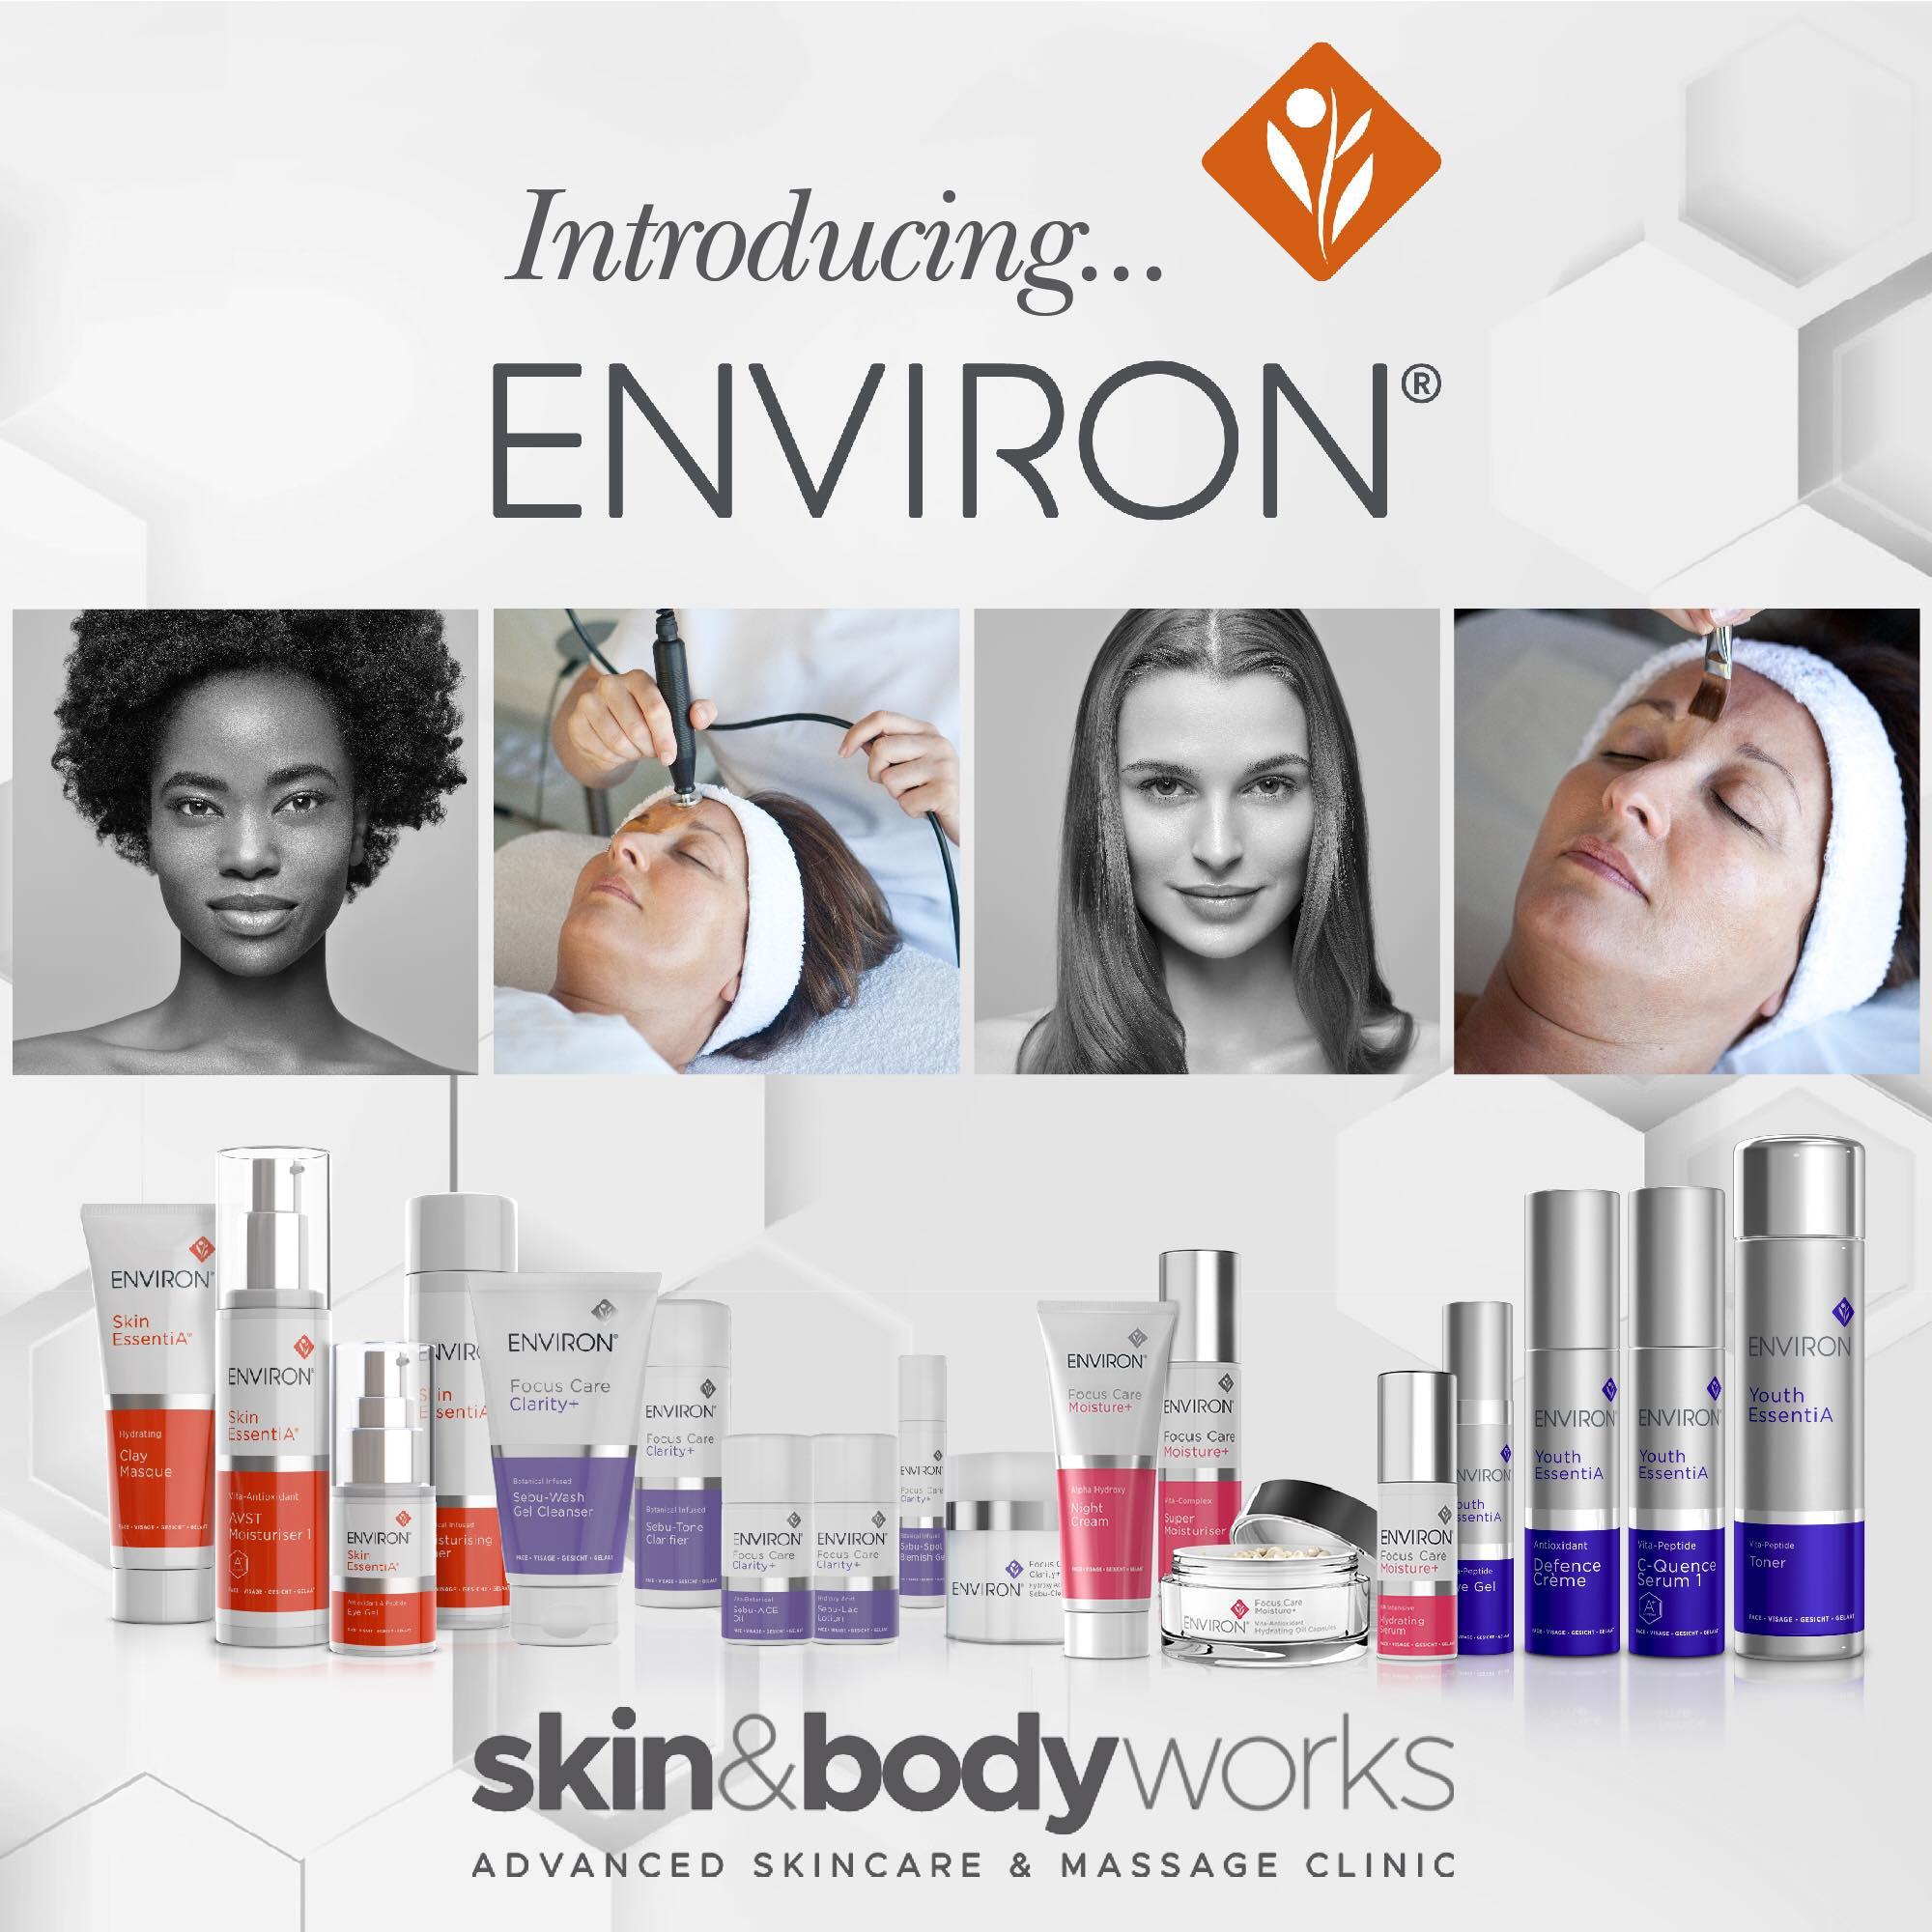 Introducing Environ!